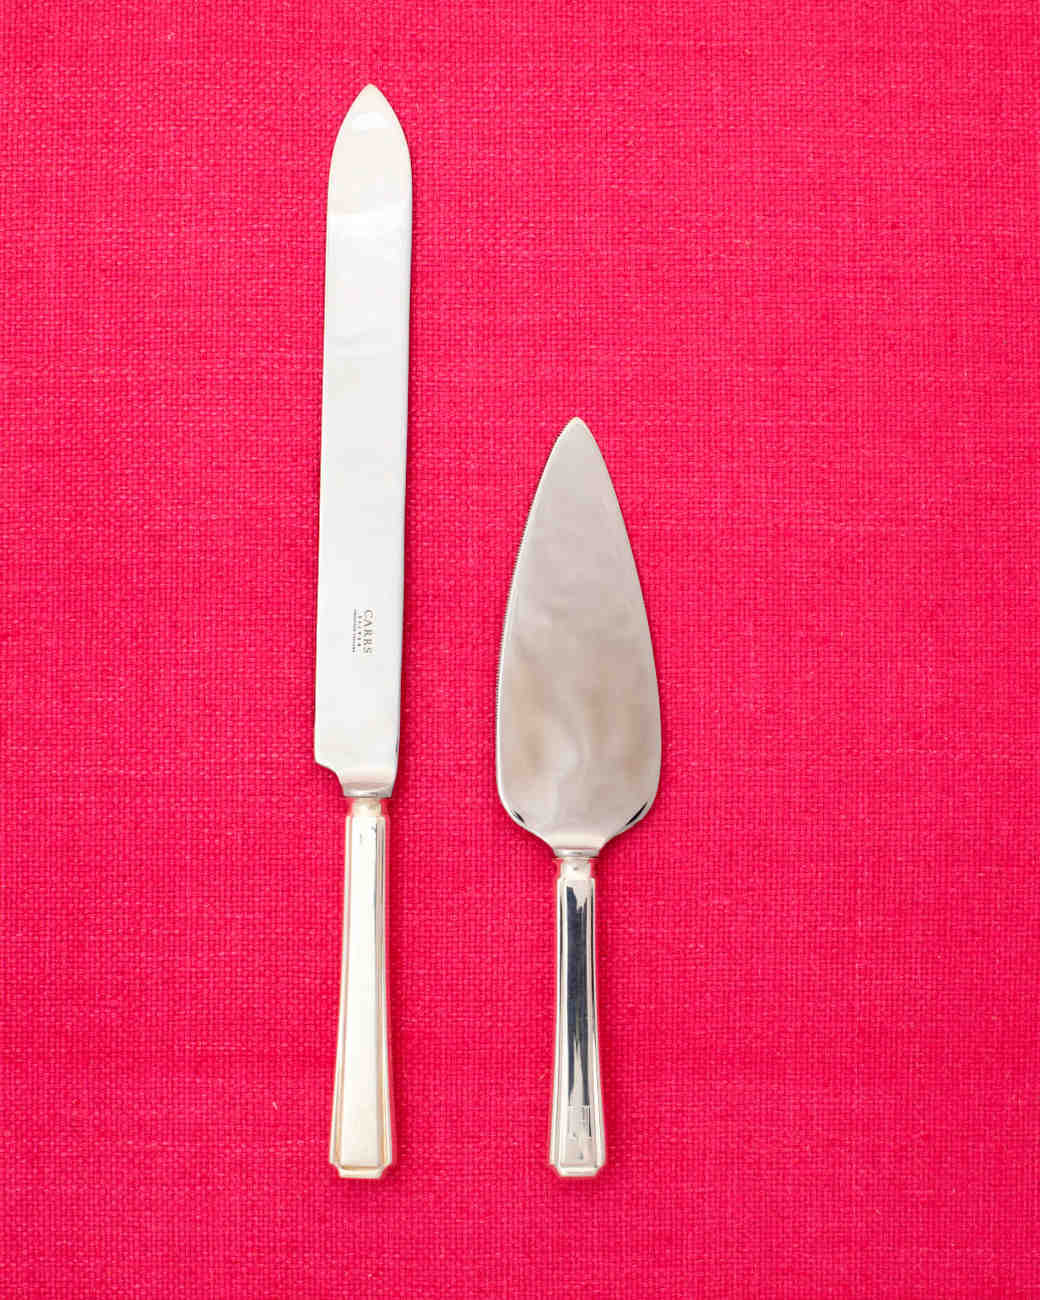 serving-knives-wd107851.jpg